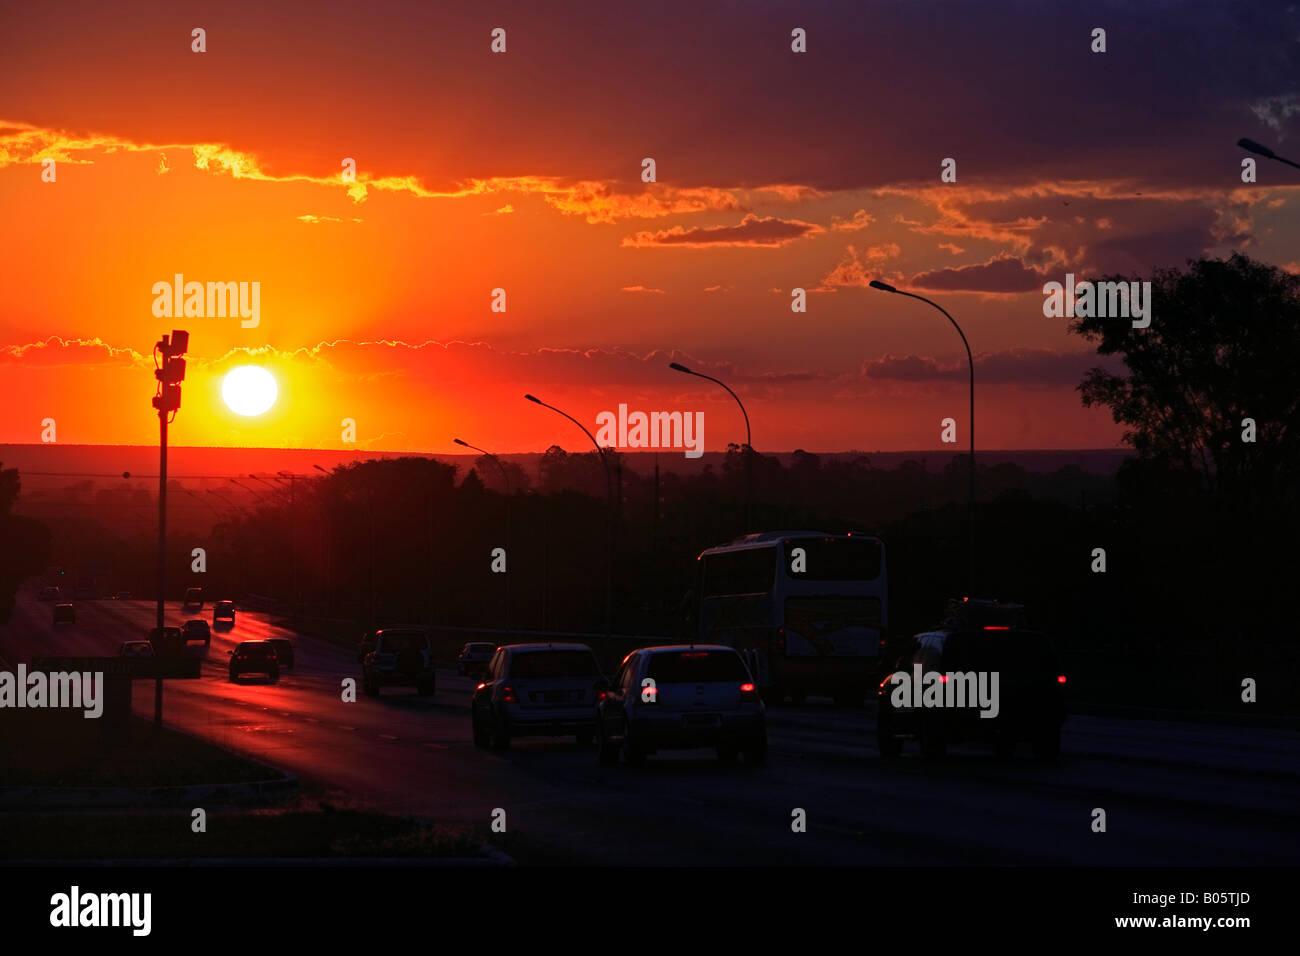 traffic at sunset in  Brasilia city capital of Brazil - Stock Image